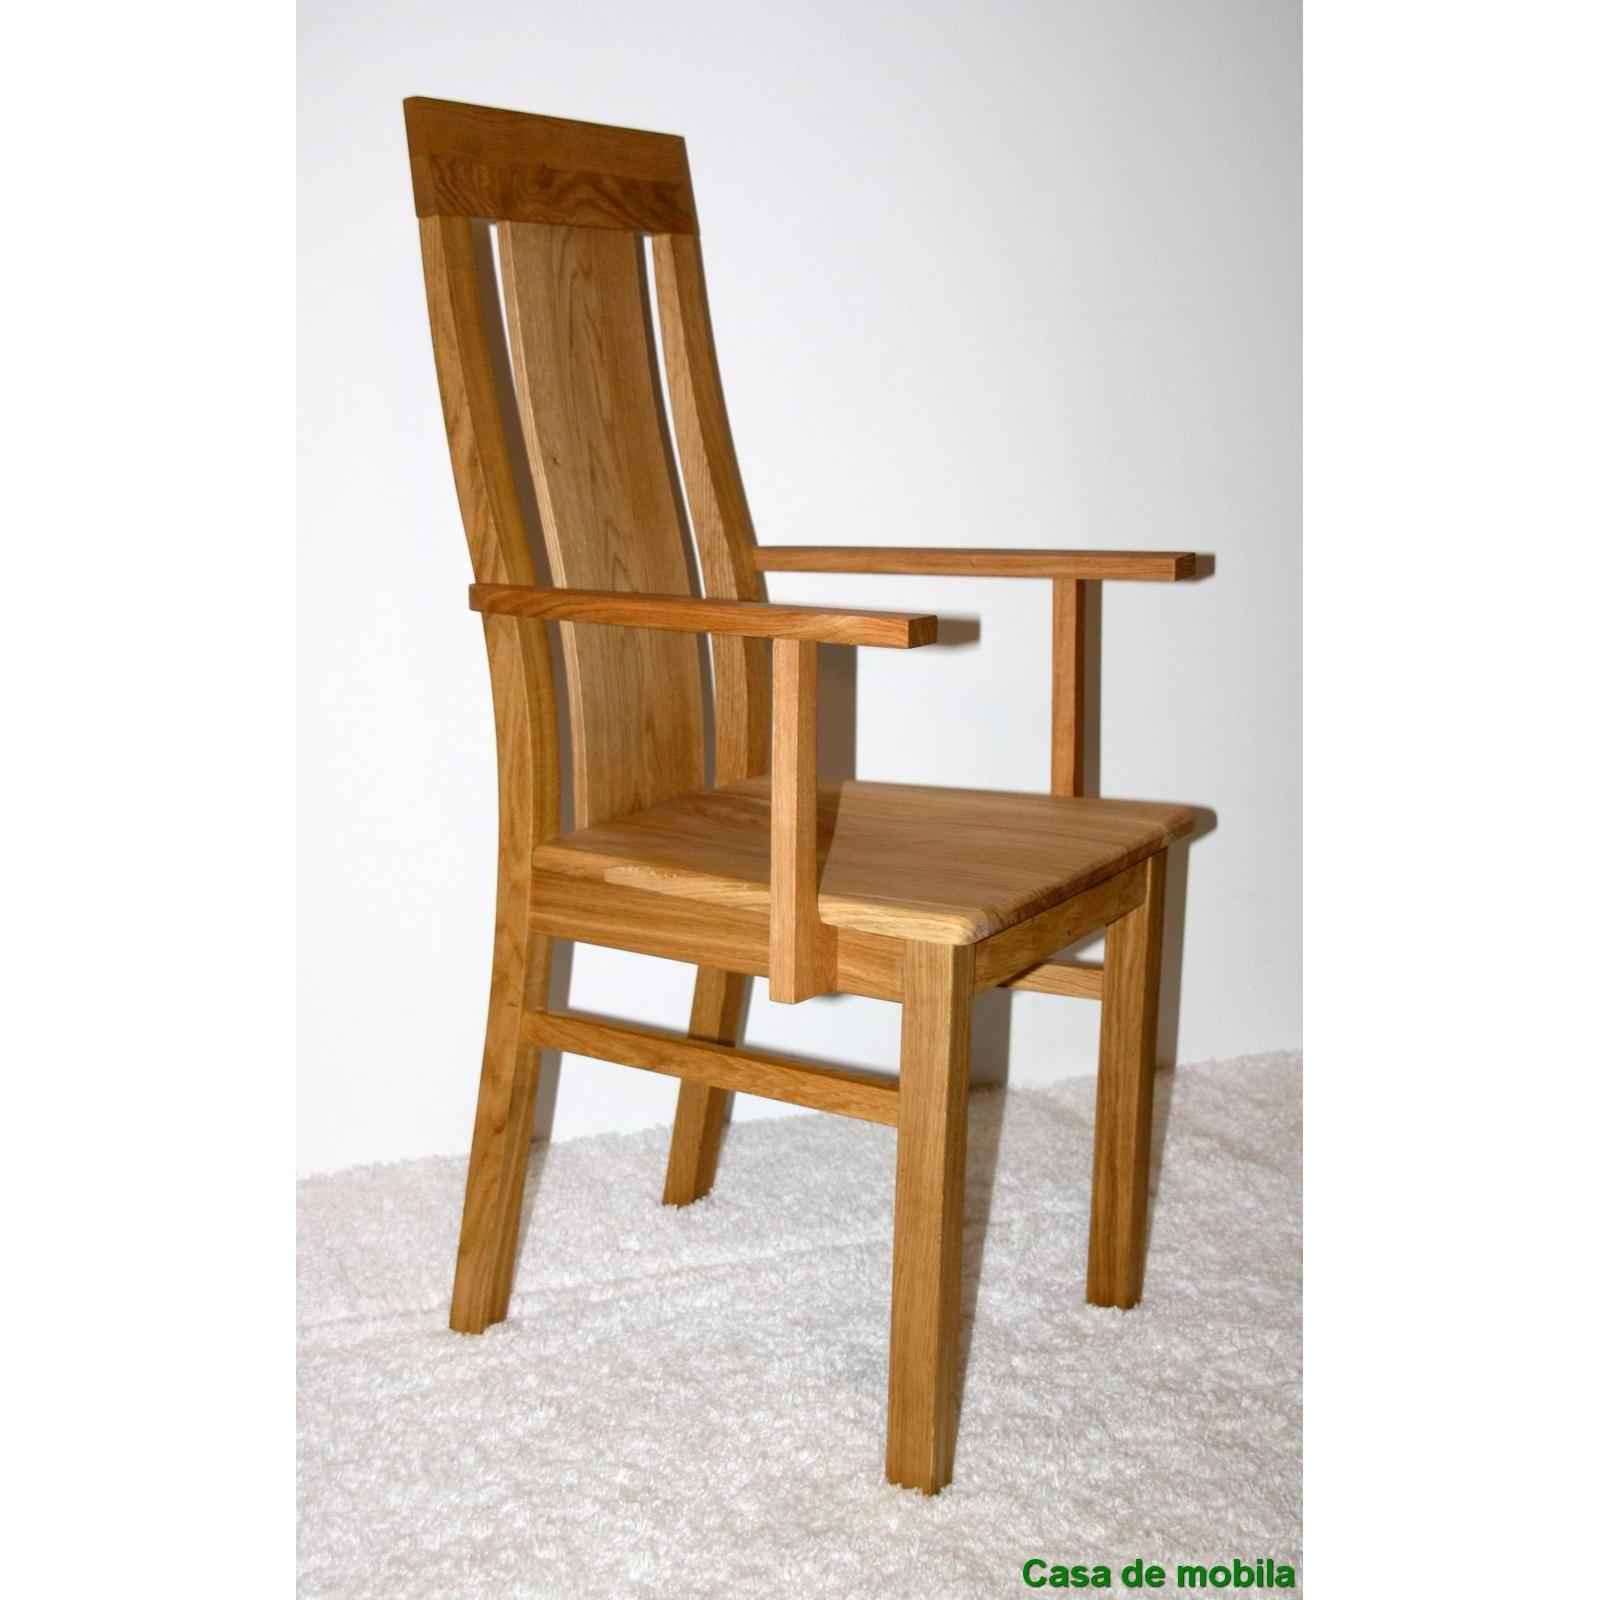 massivholz armlehnstuhl wildeiche massiv ge lt stuhl mit armlehne ebay. Black Bedroom Furniture Sets. Home Design Ideas